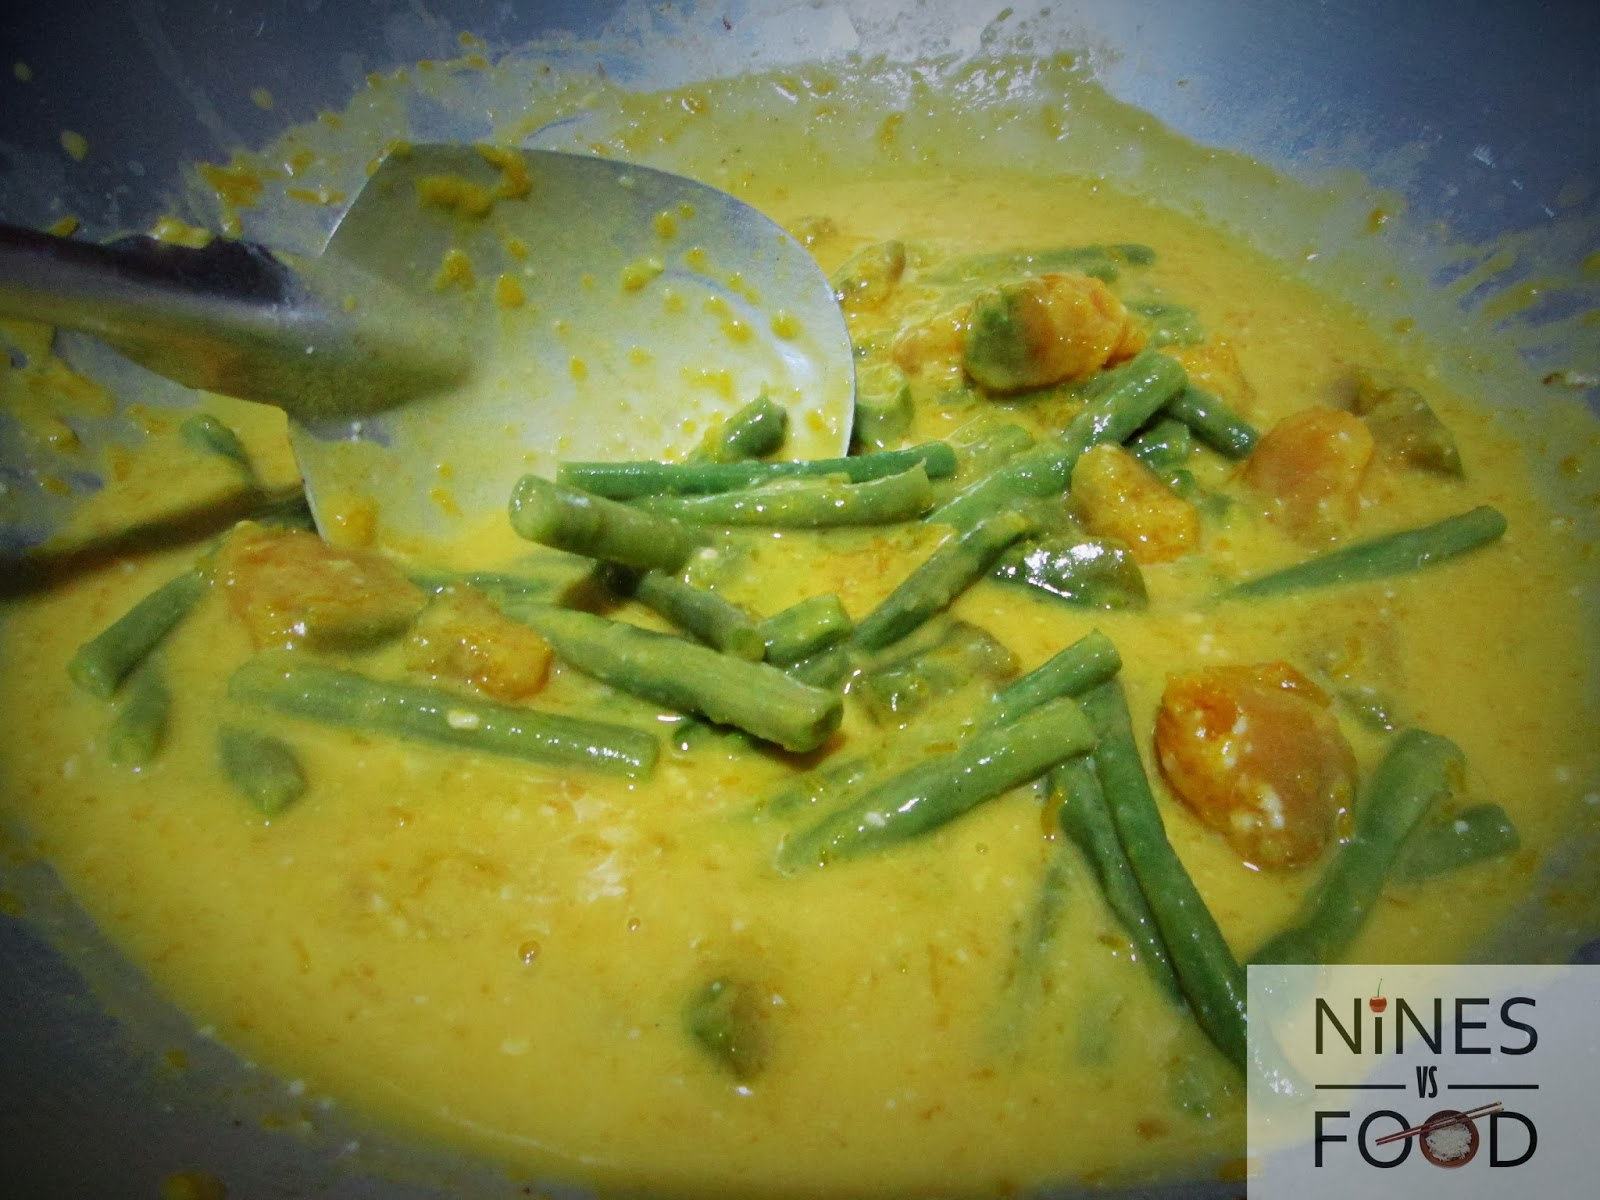 Nines vs. Food - How To Make Ginataang Gulay with Pig Ears-10.jpg